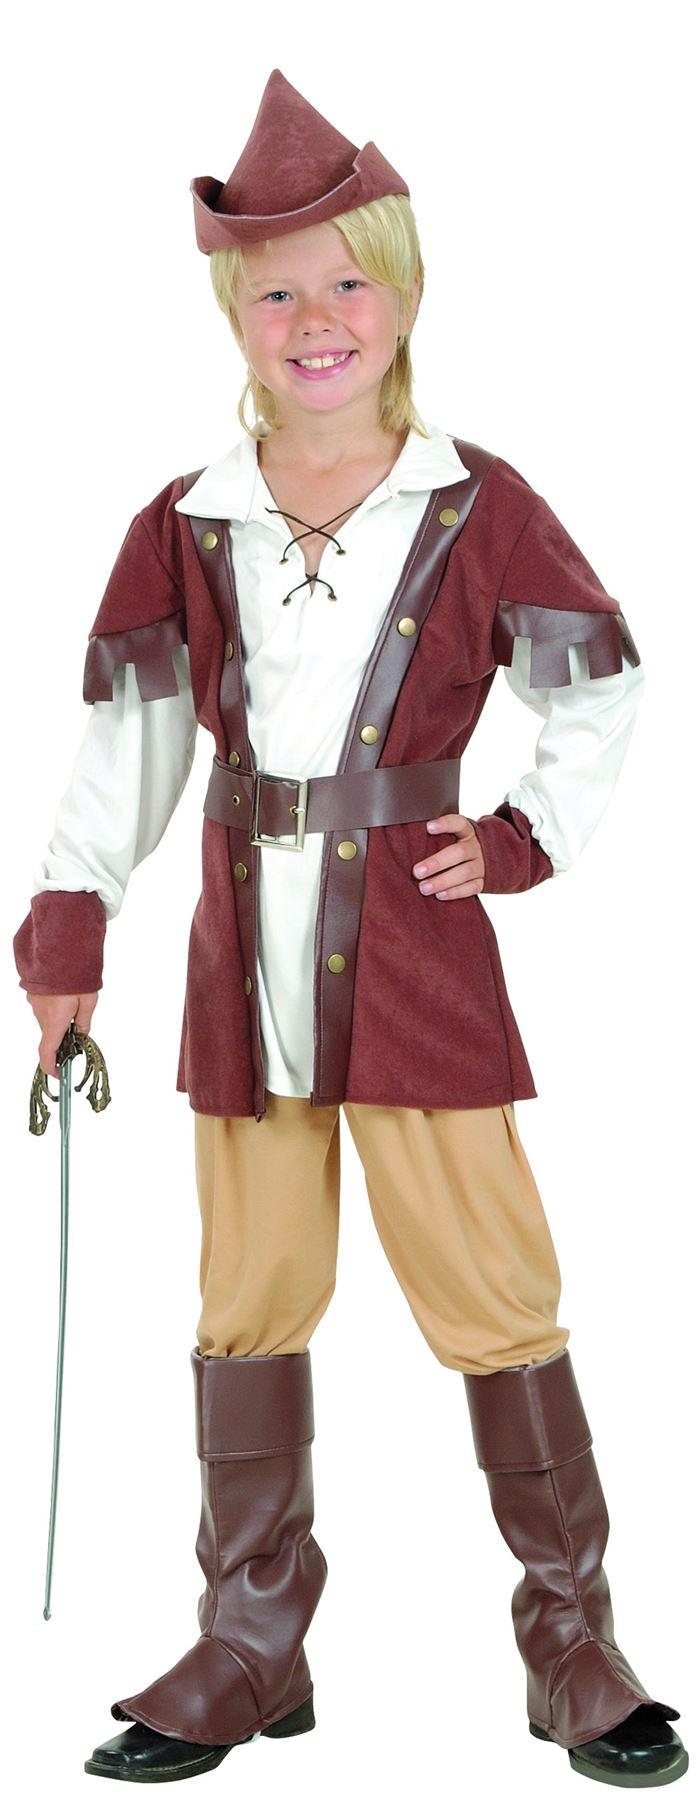 Pics photos fancy dress costume boys robin hood toddler age 2 3